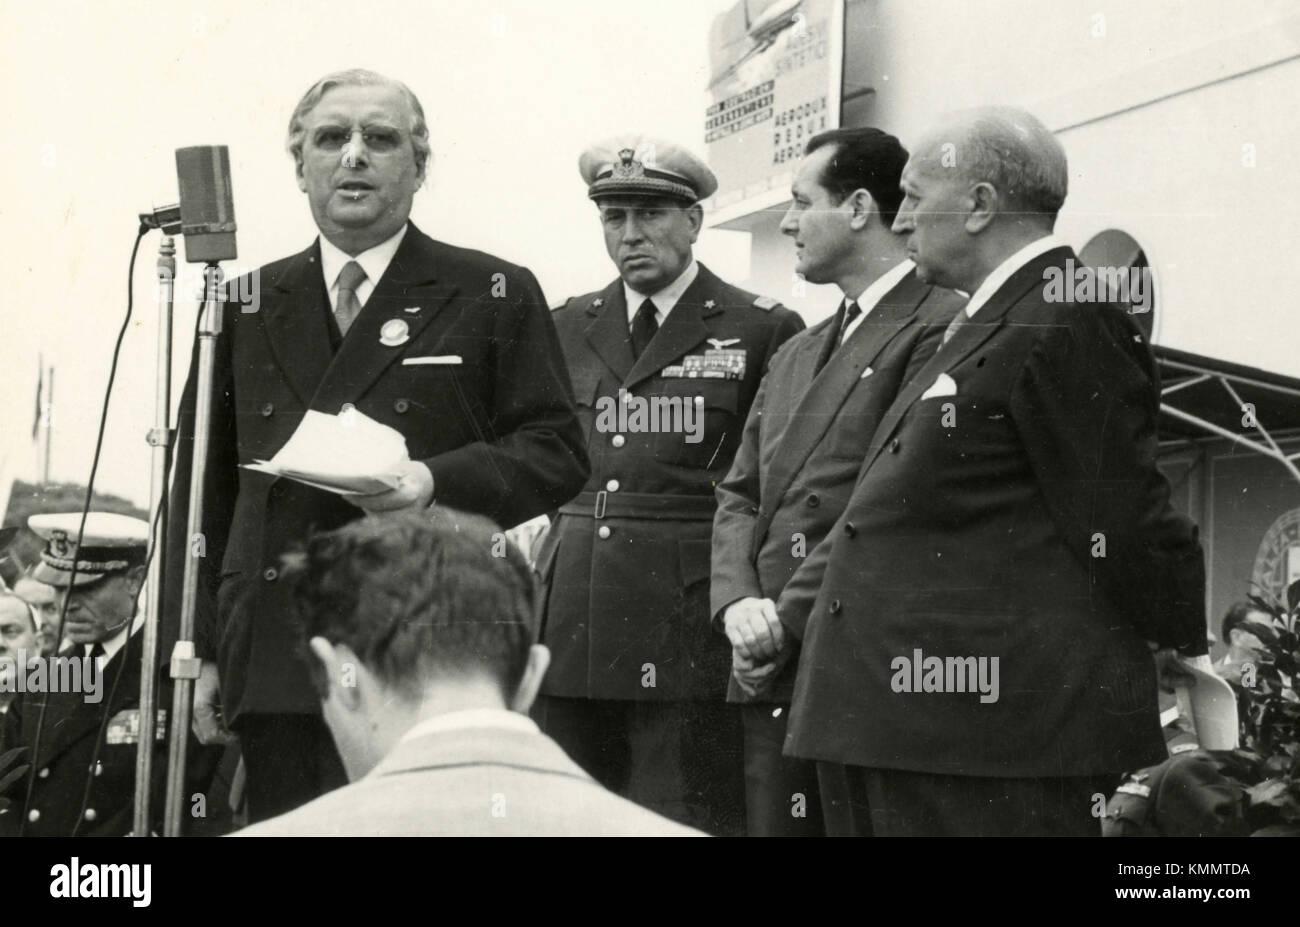 Unidentified authorities of Aeronautics, Italy 1950s - Stock Image